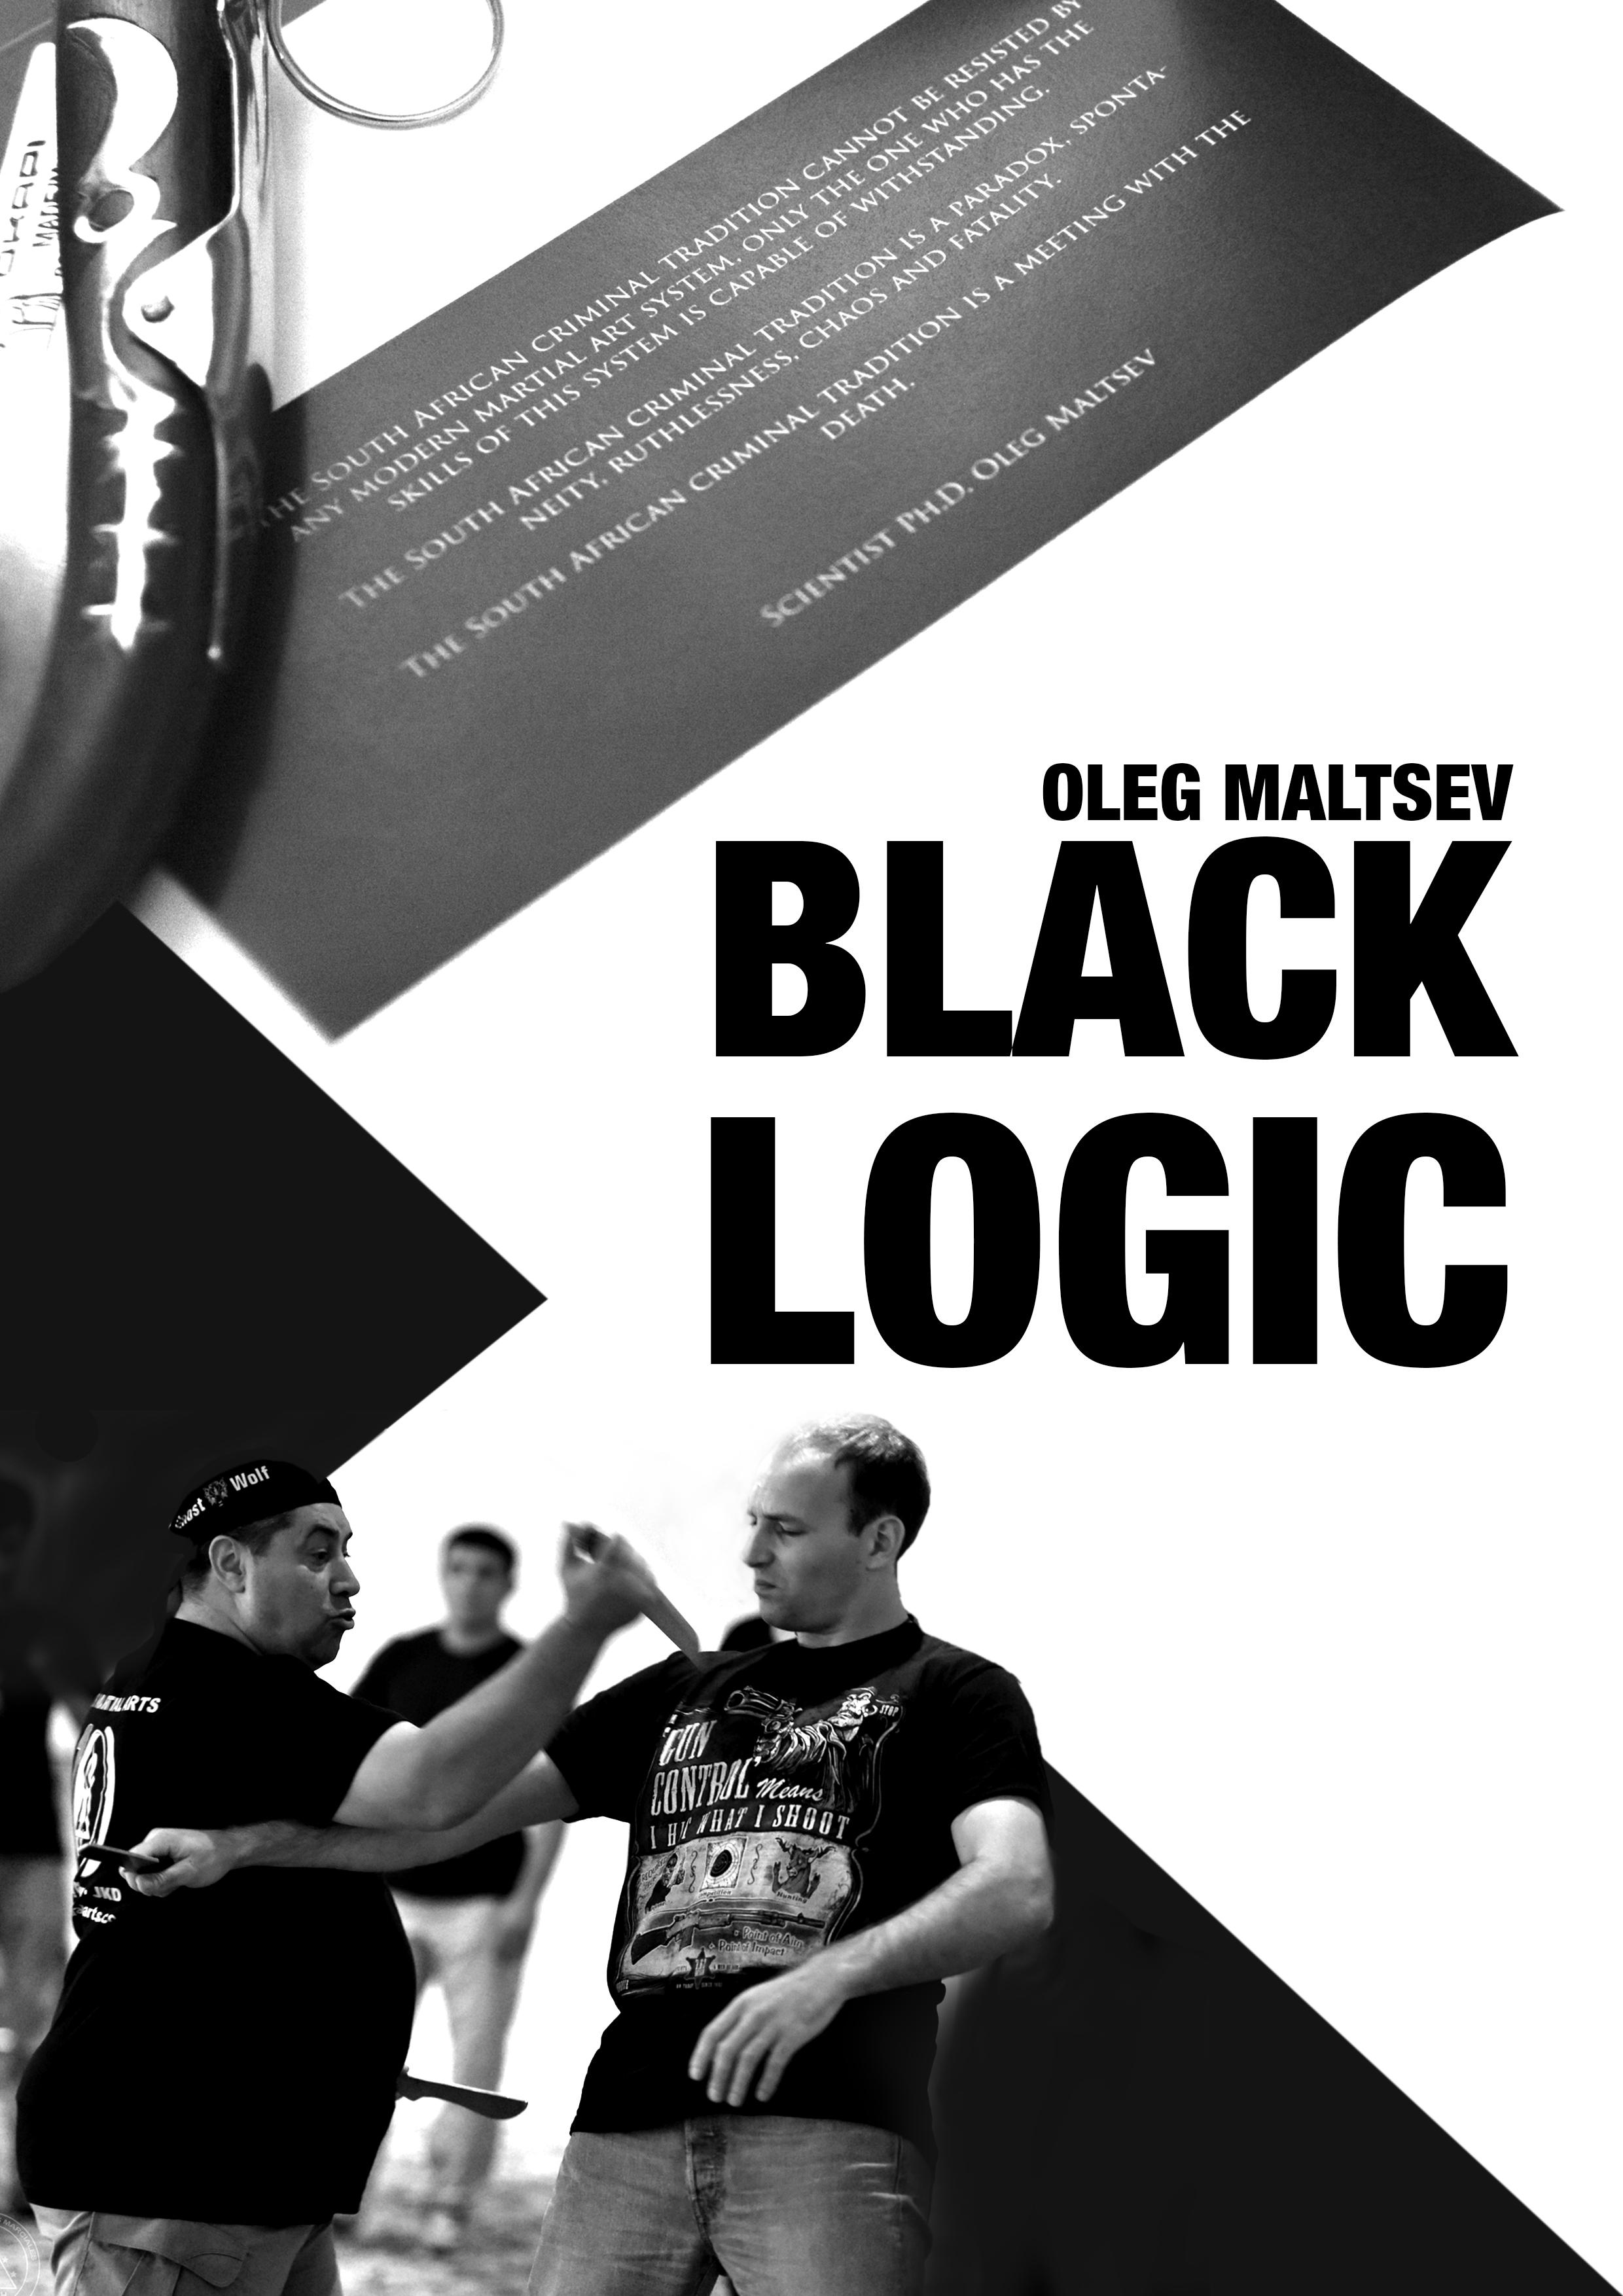 Black logic. Oleg Maltsev